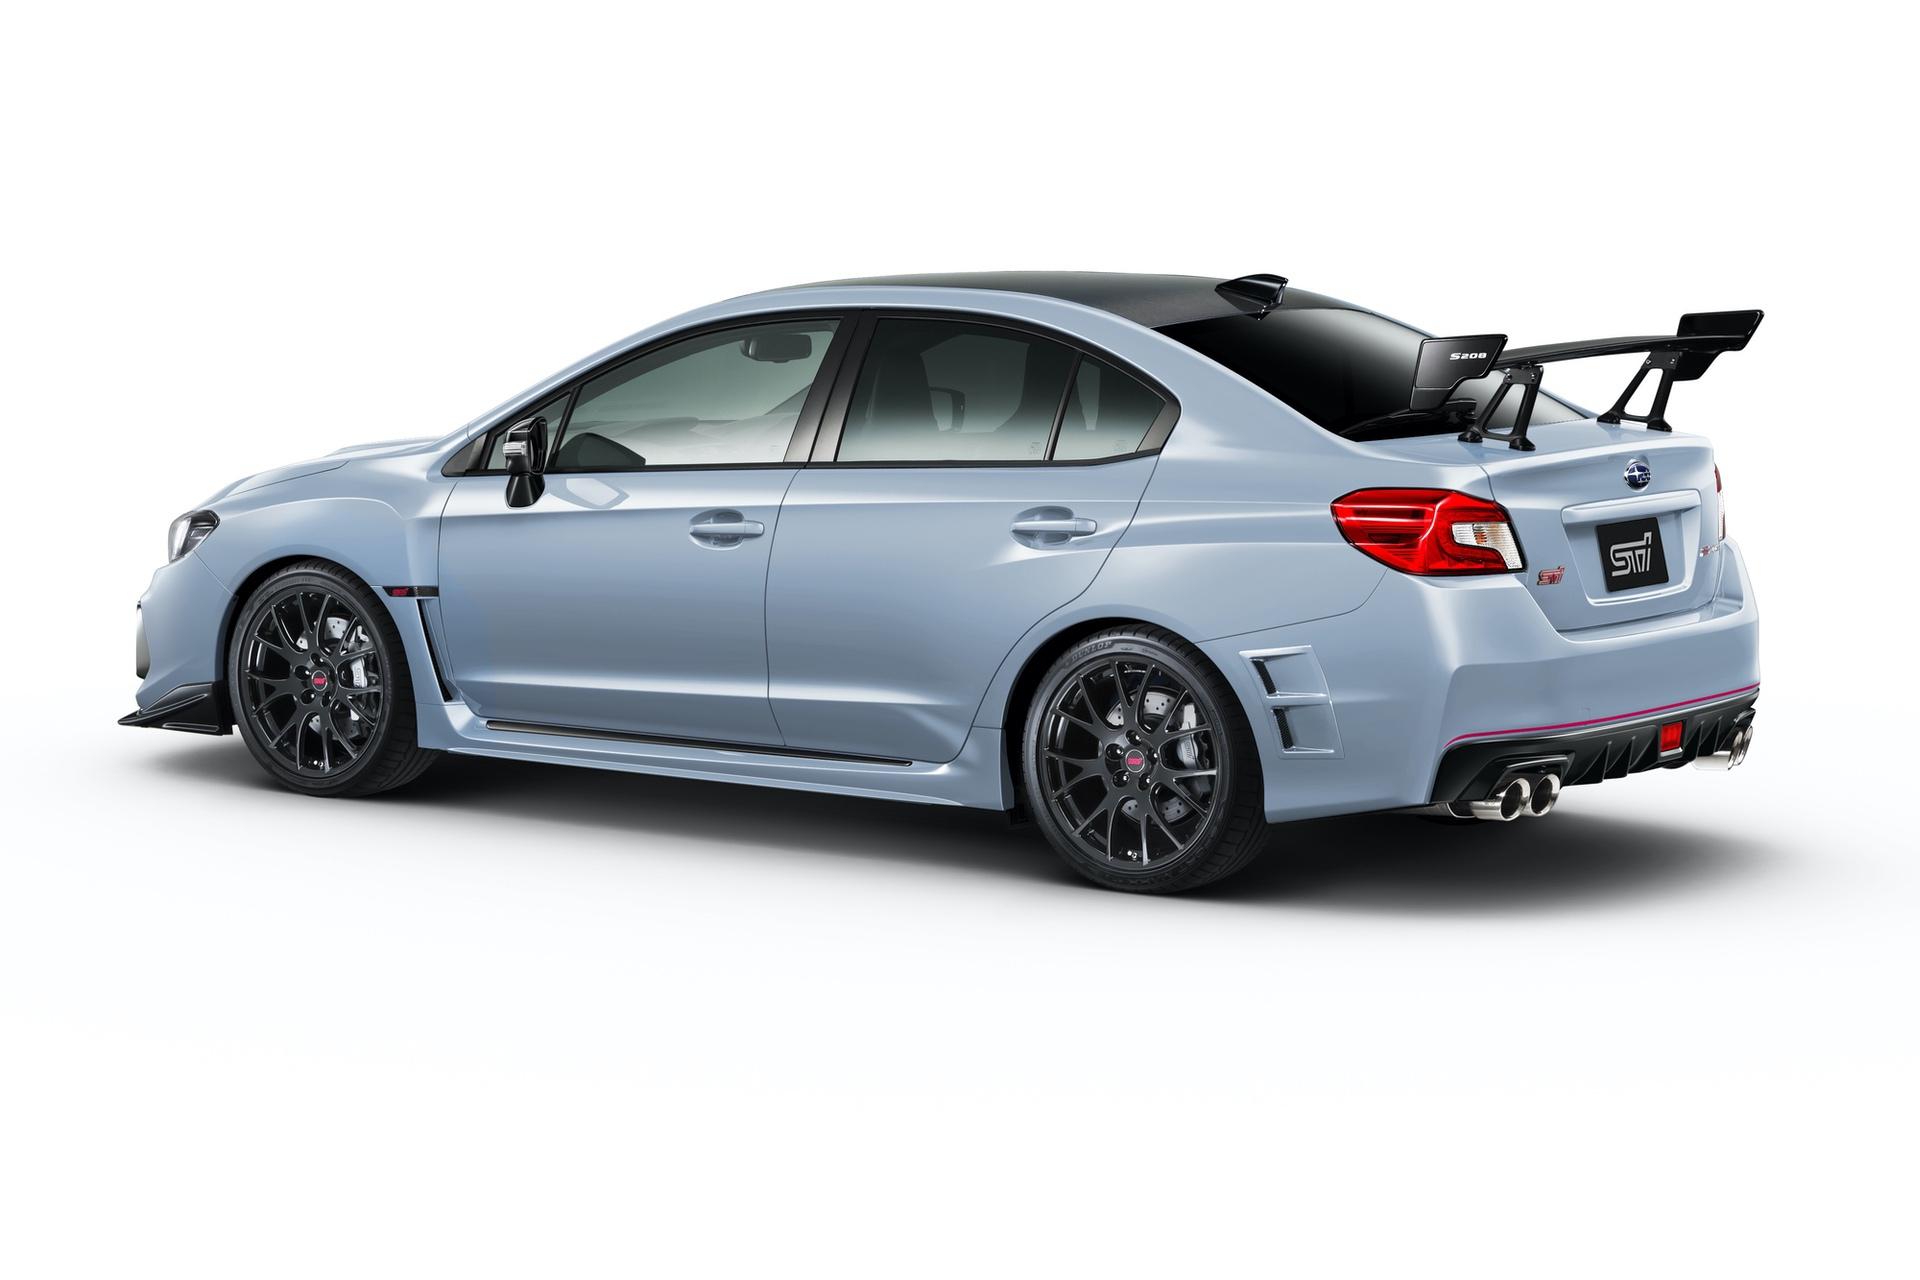 Subaru_WRX_STI_S208_NBR_Challenge_Package_0001